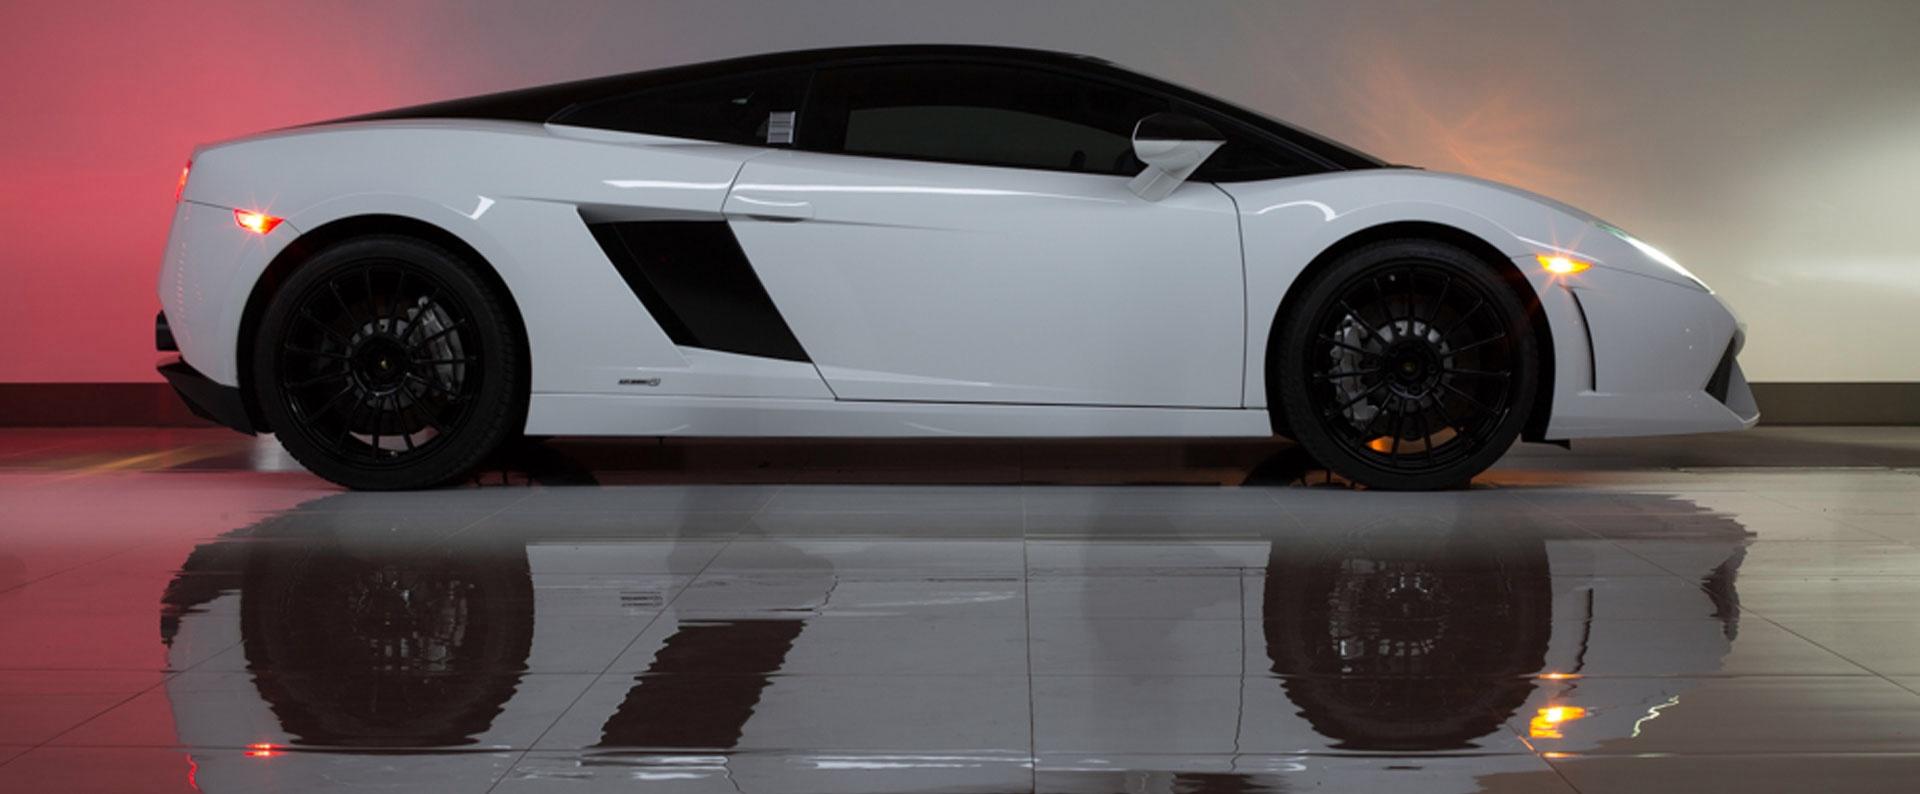 Used 2011 Lamborghini Gallardo LP 550-2 Valentino Balboni | Miami, FL